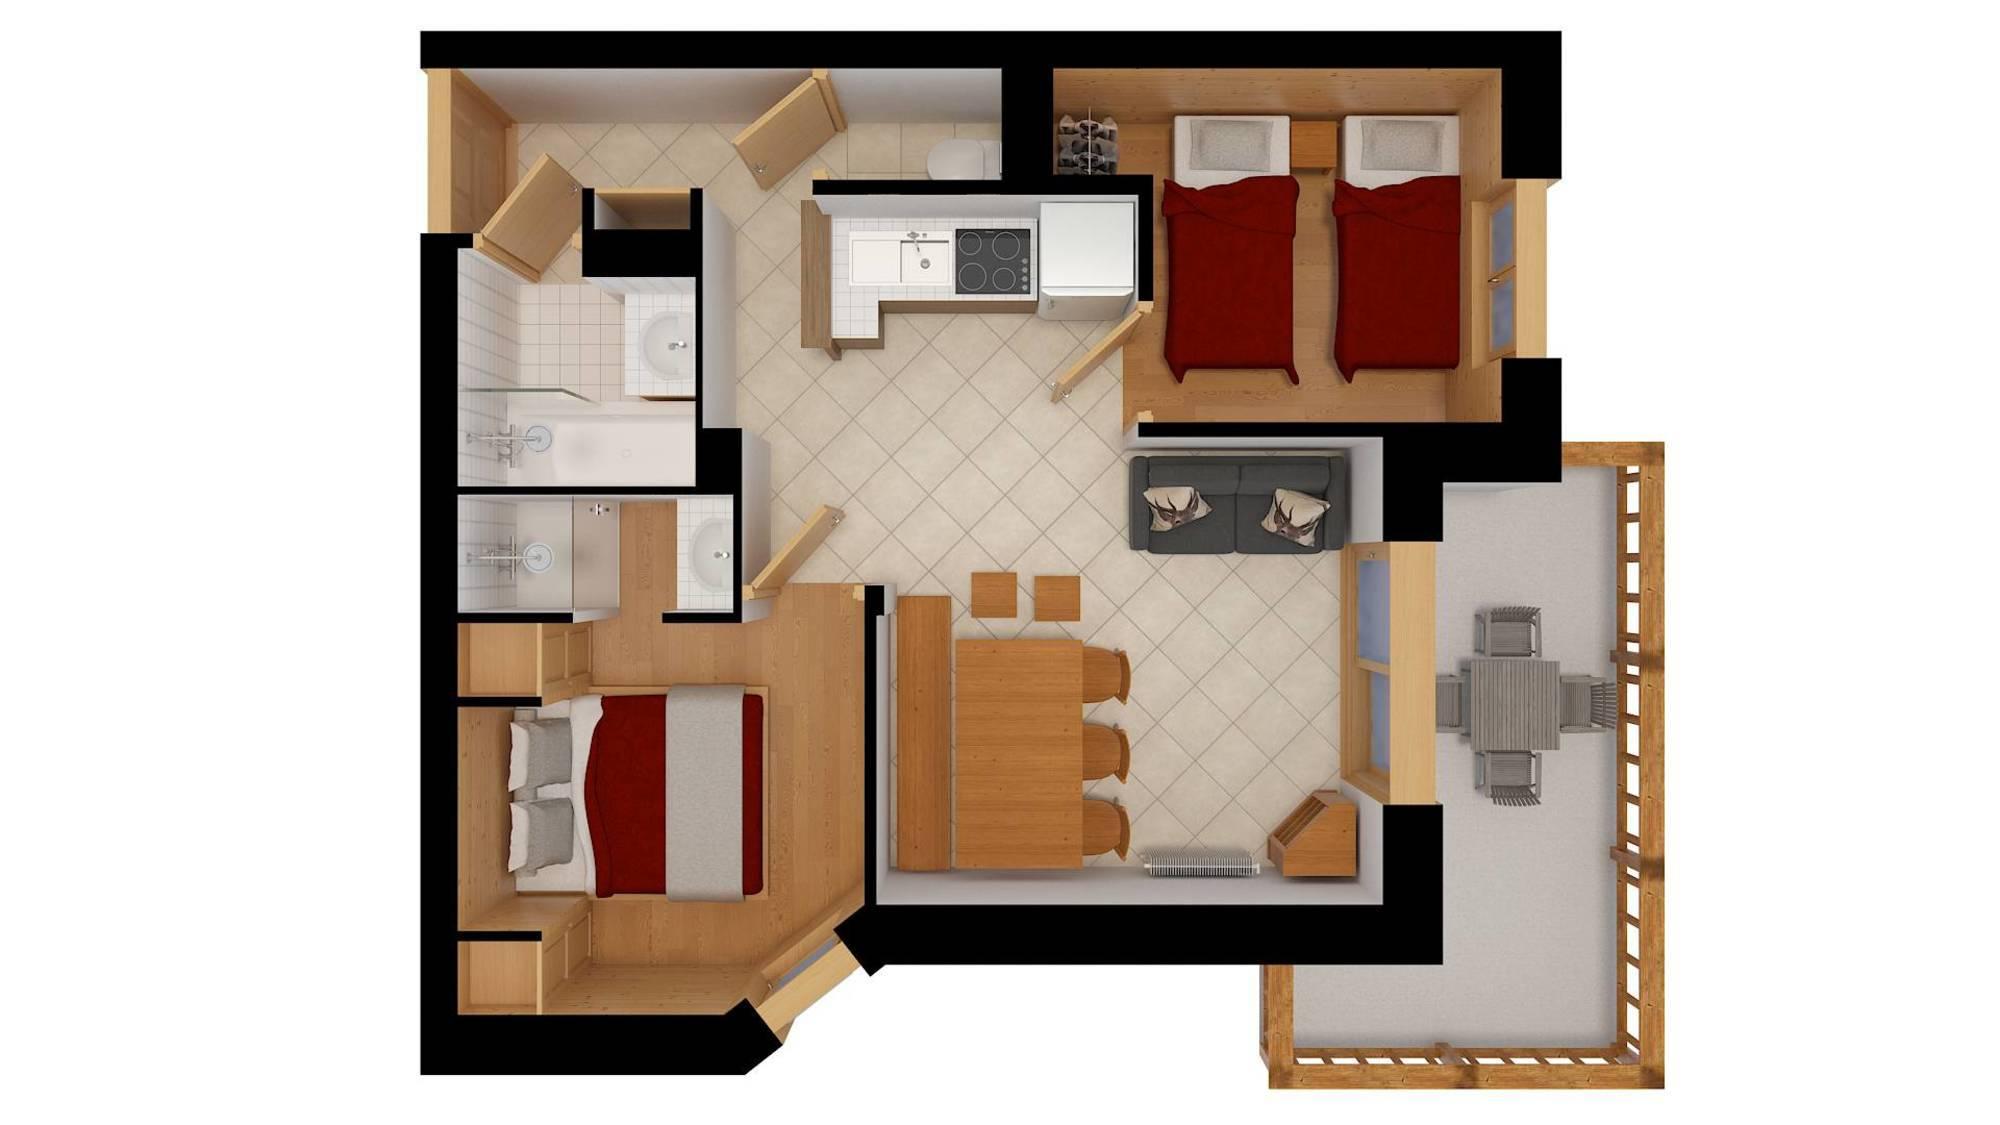 Apartment Ferme A106 Meribel Floor Plan 1